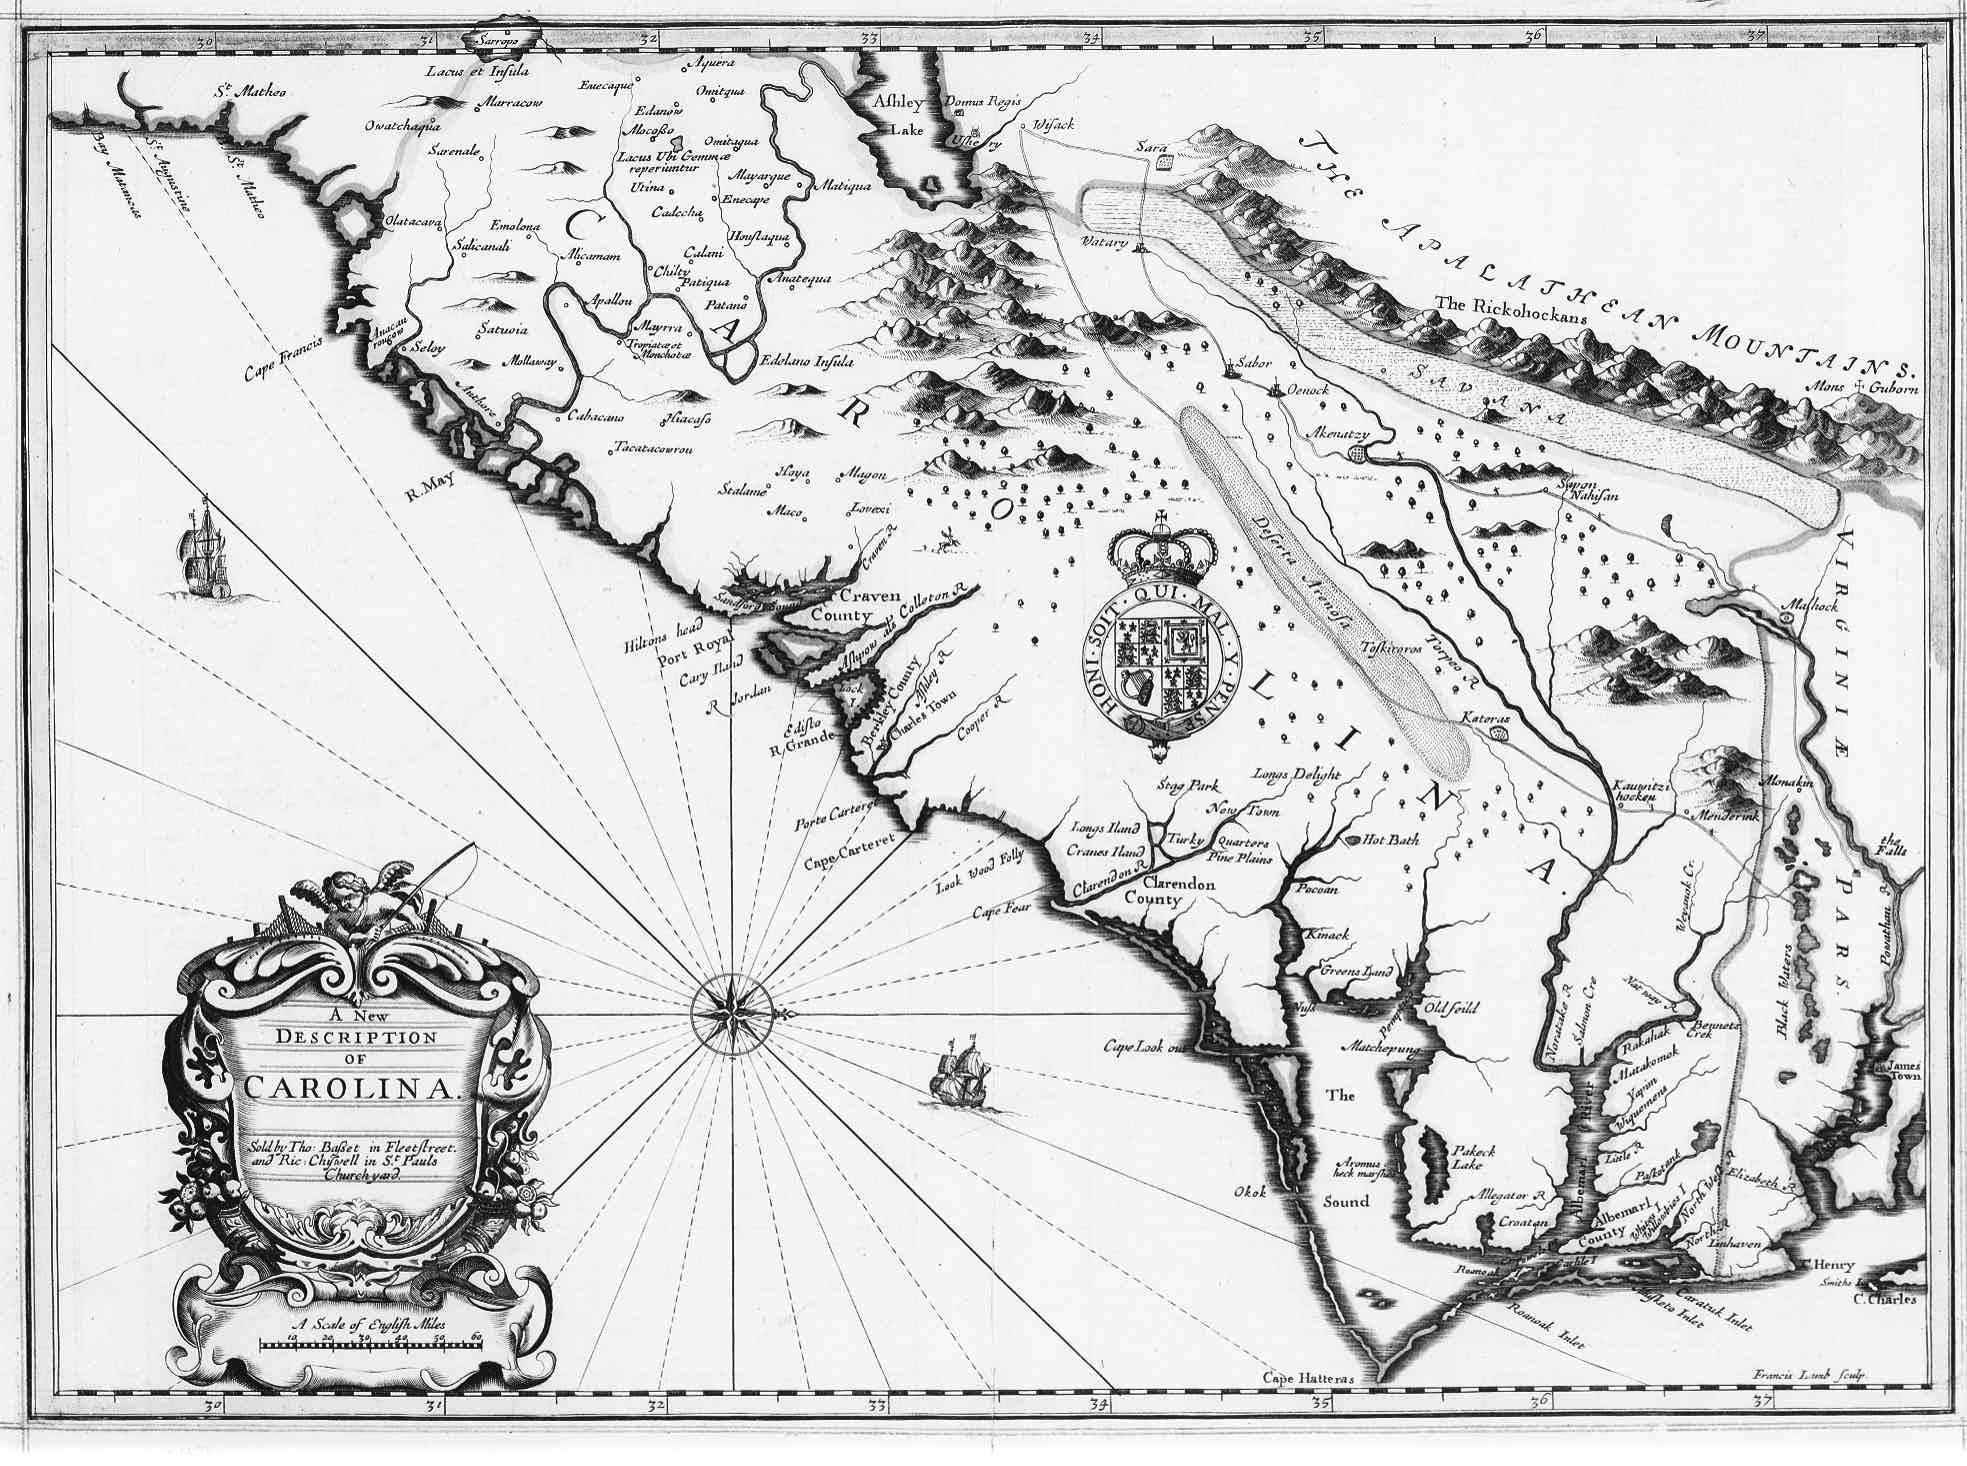 Us gebweb digital map library north carolina 1676 a new description of carolina size 275kb drawn by francis lamb source unknown publicscrutiny Gallery